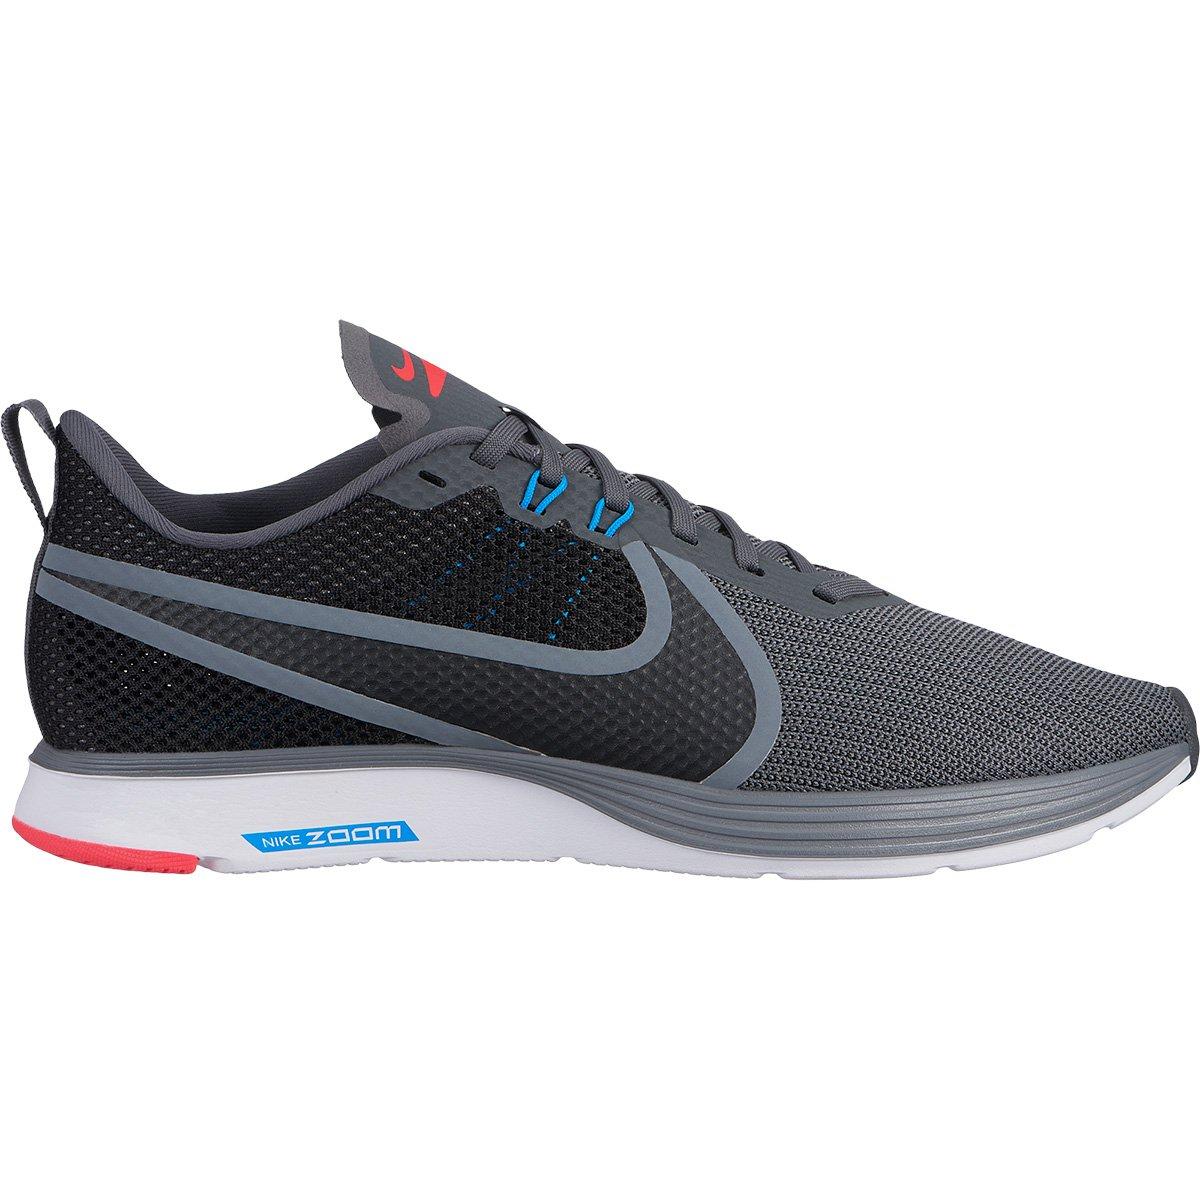 designer fashion 8d372 623c0 Tênis Nike Zoom Strike 2 Masculino - Preto e Cinza   Shop Timão